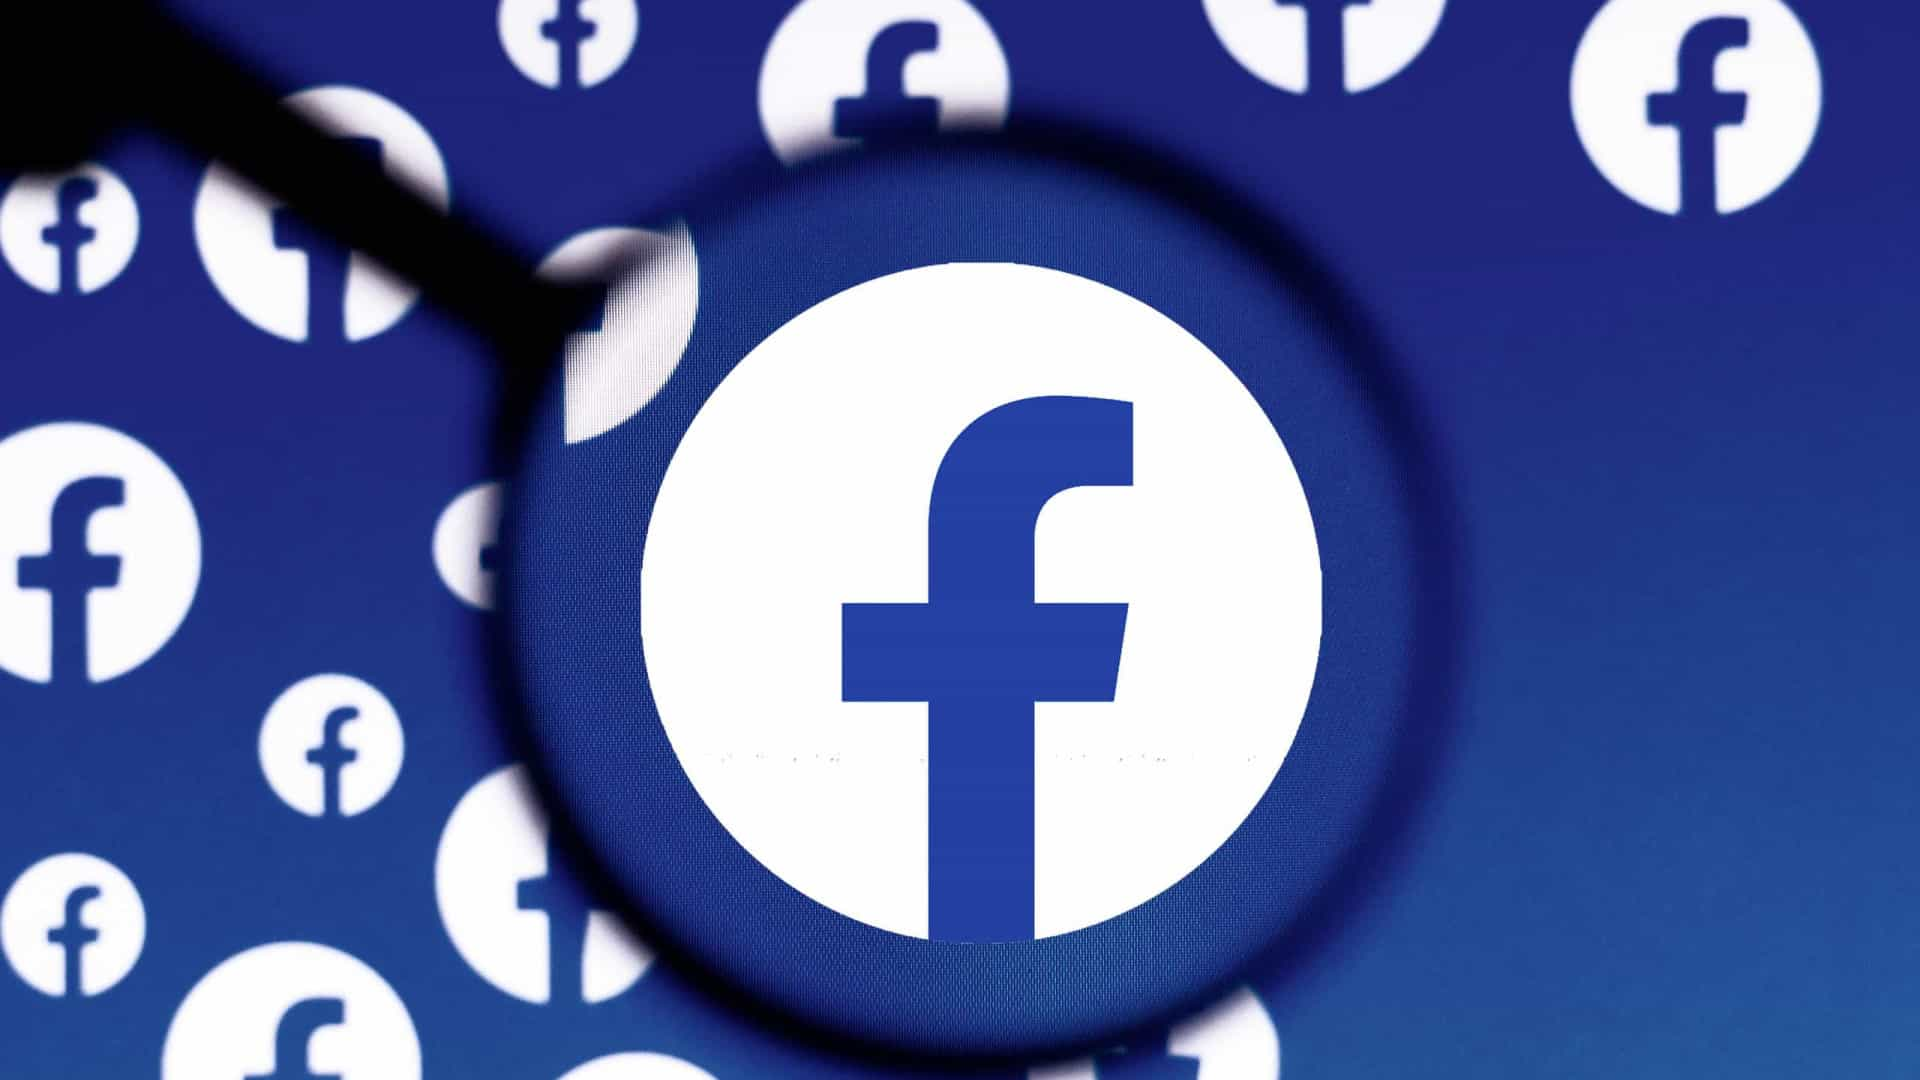 Facebook é notificado pelo Procon por apagão nos aplicativos